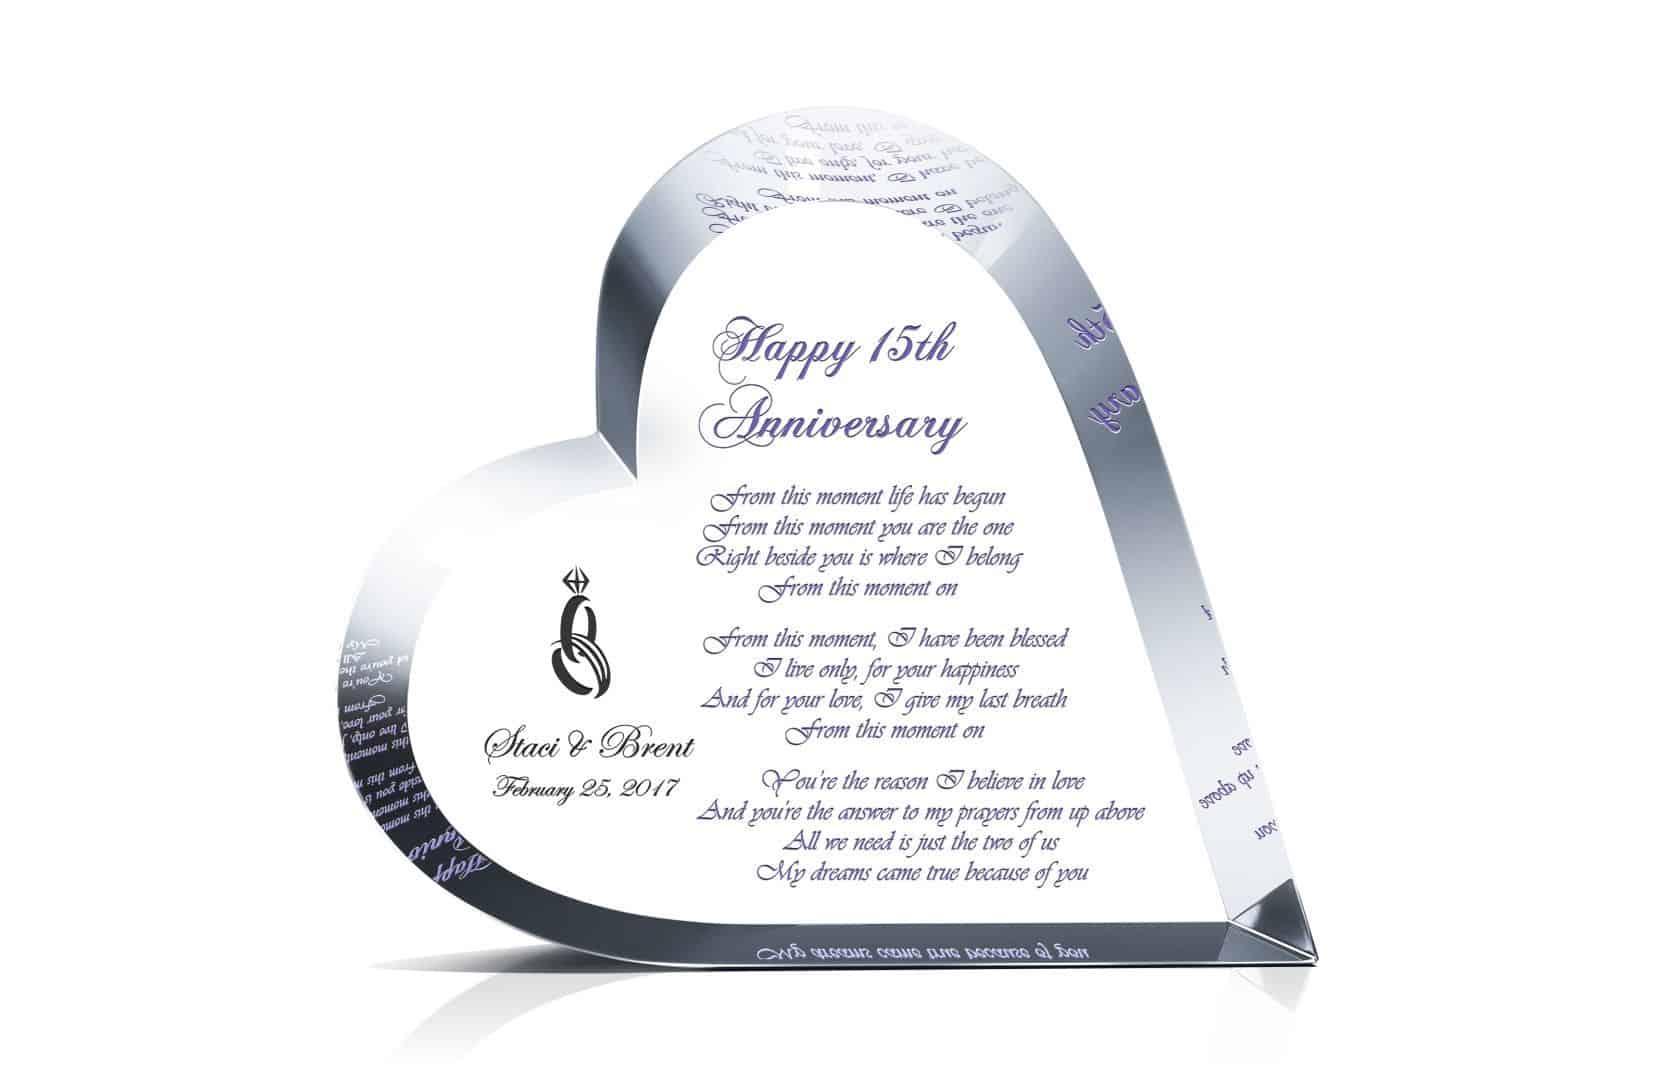 Crystal Heart 15 Anniversary Gift